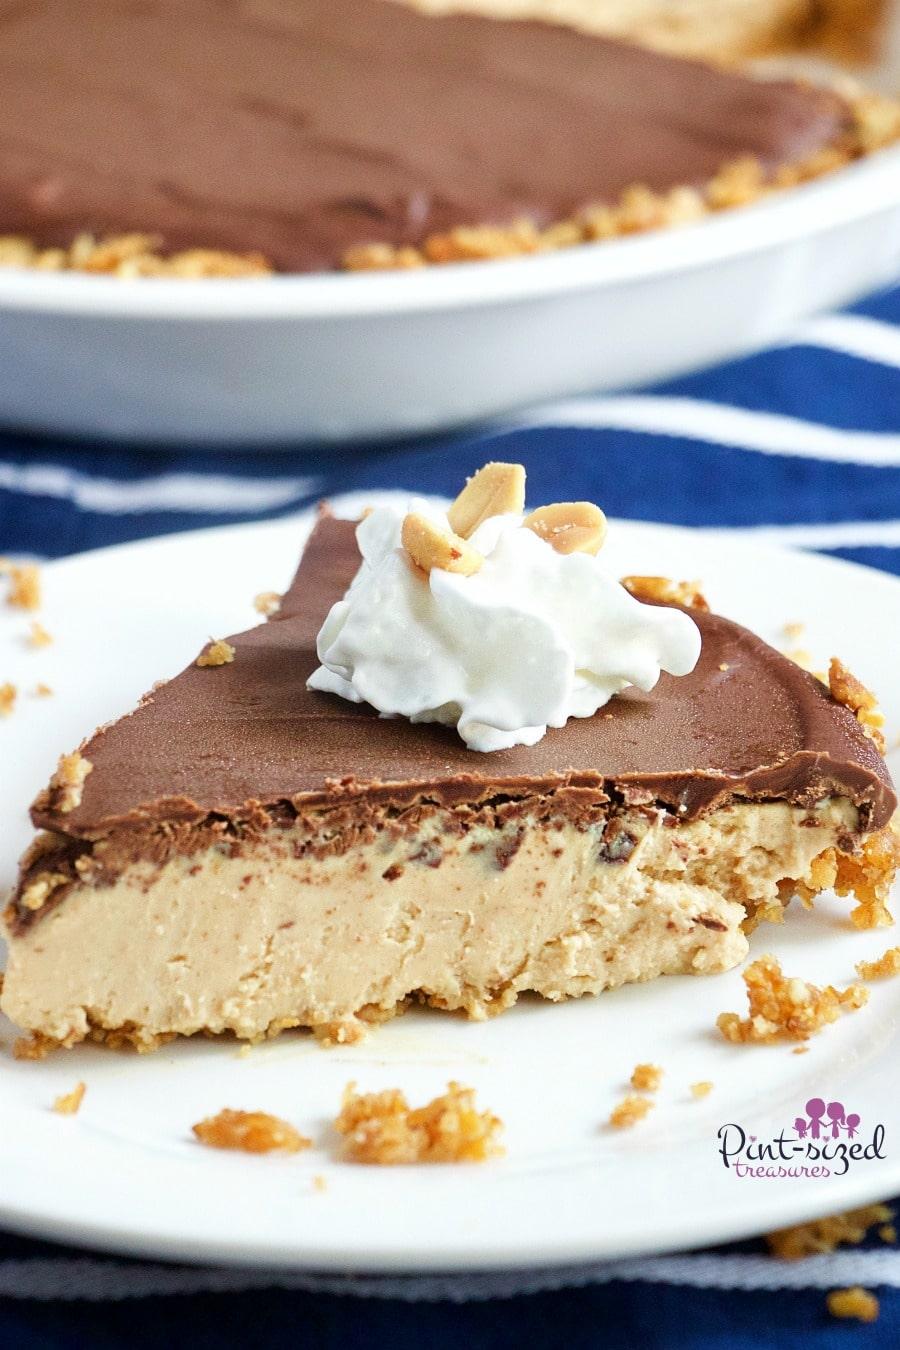 easy chocolate peanut butter cheesecake with gluten-free pretzel crust